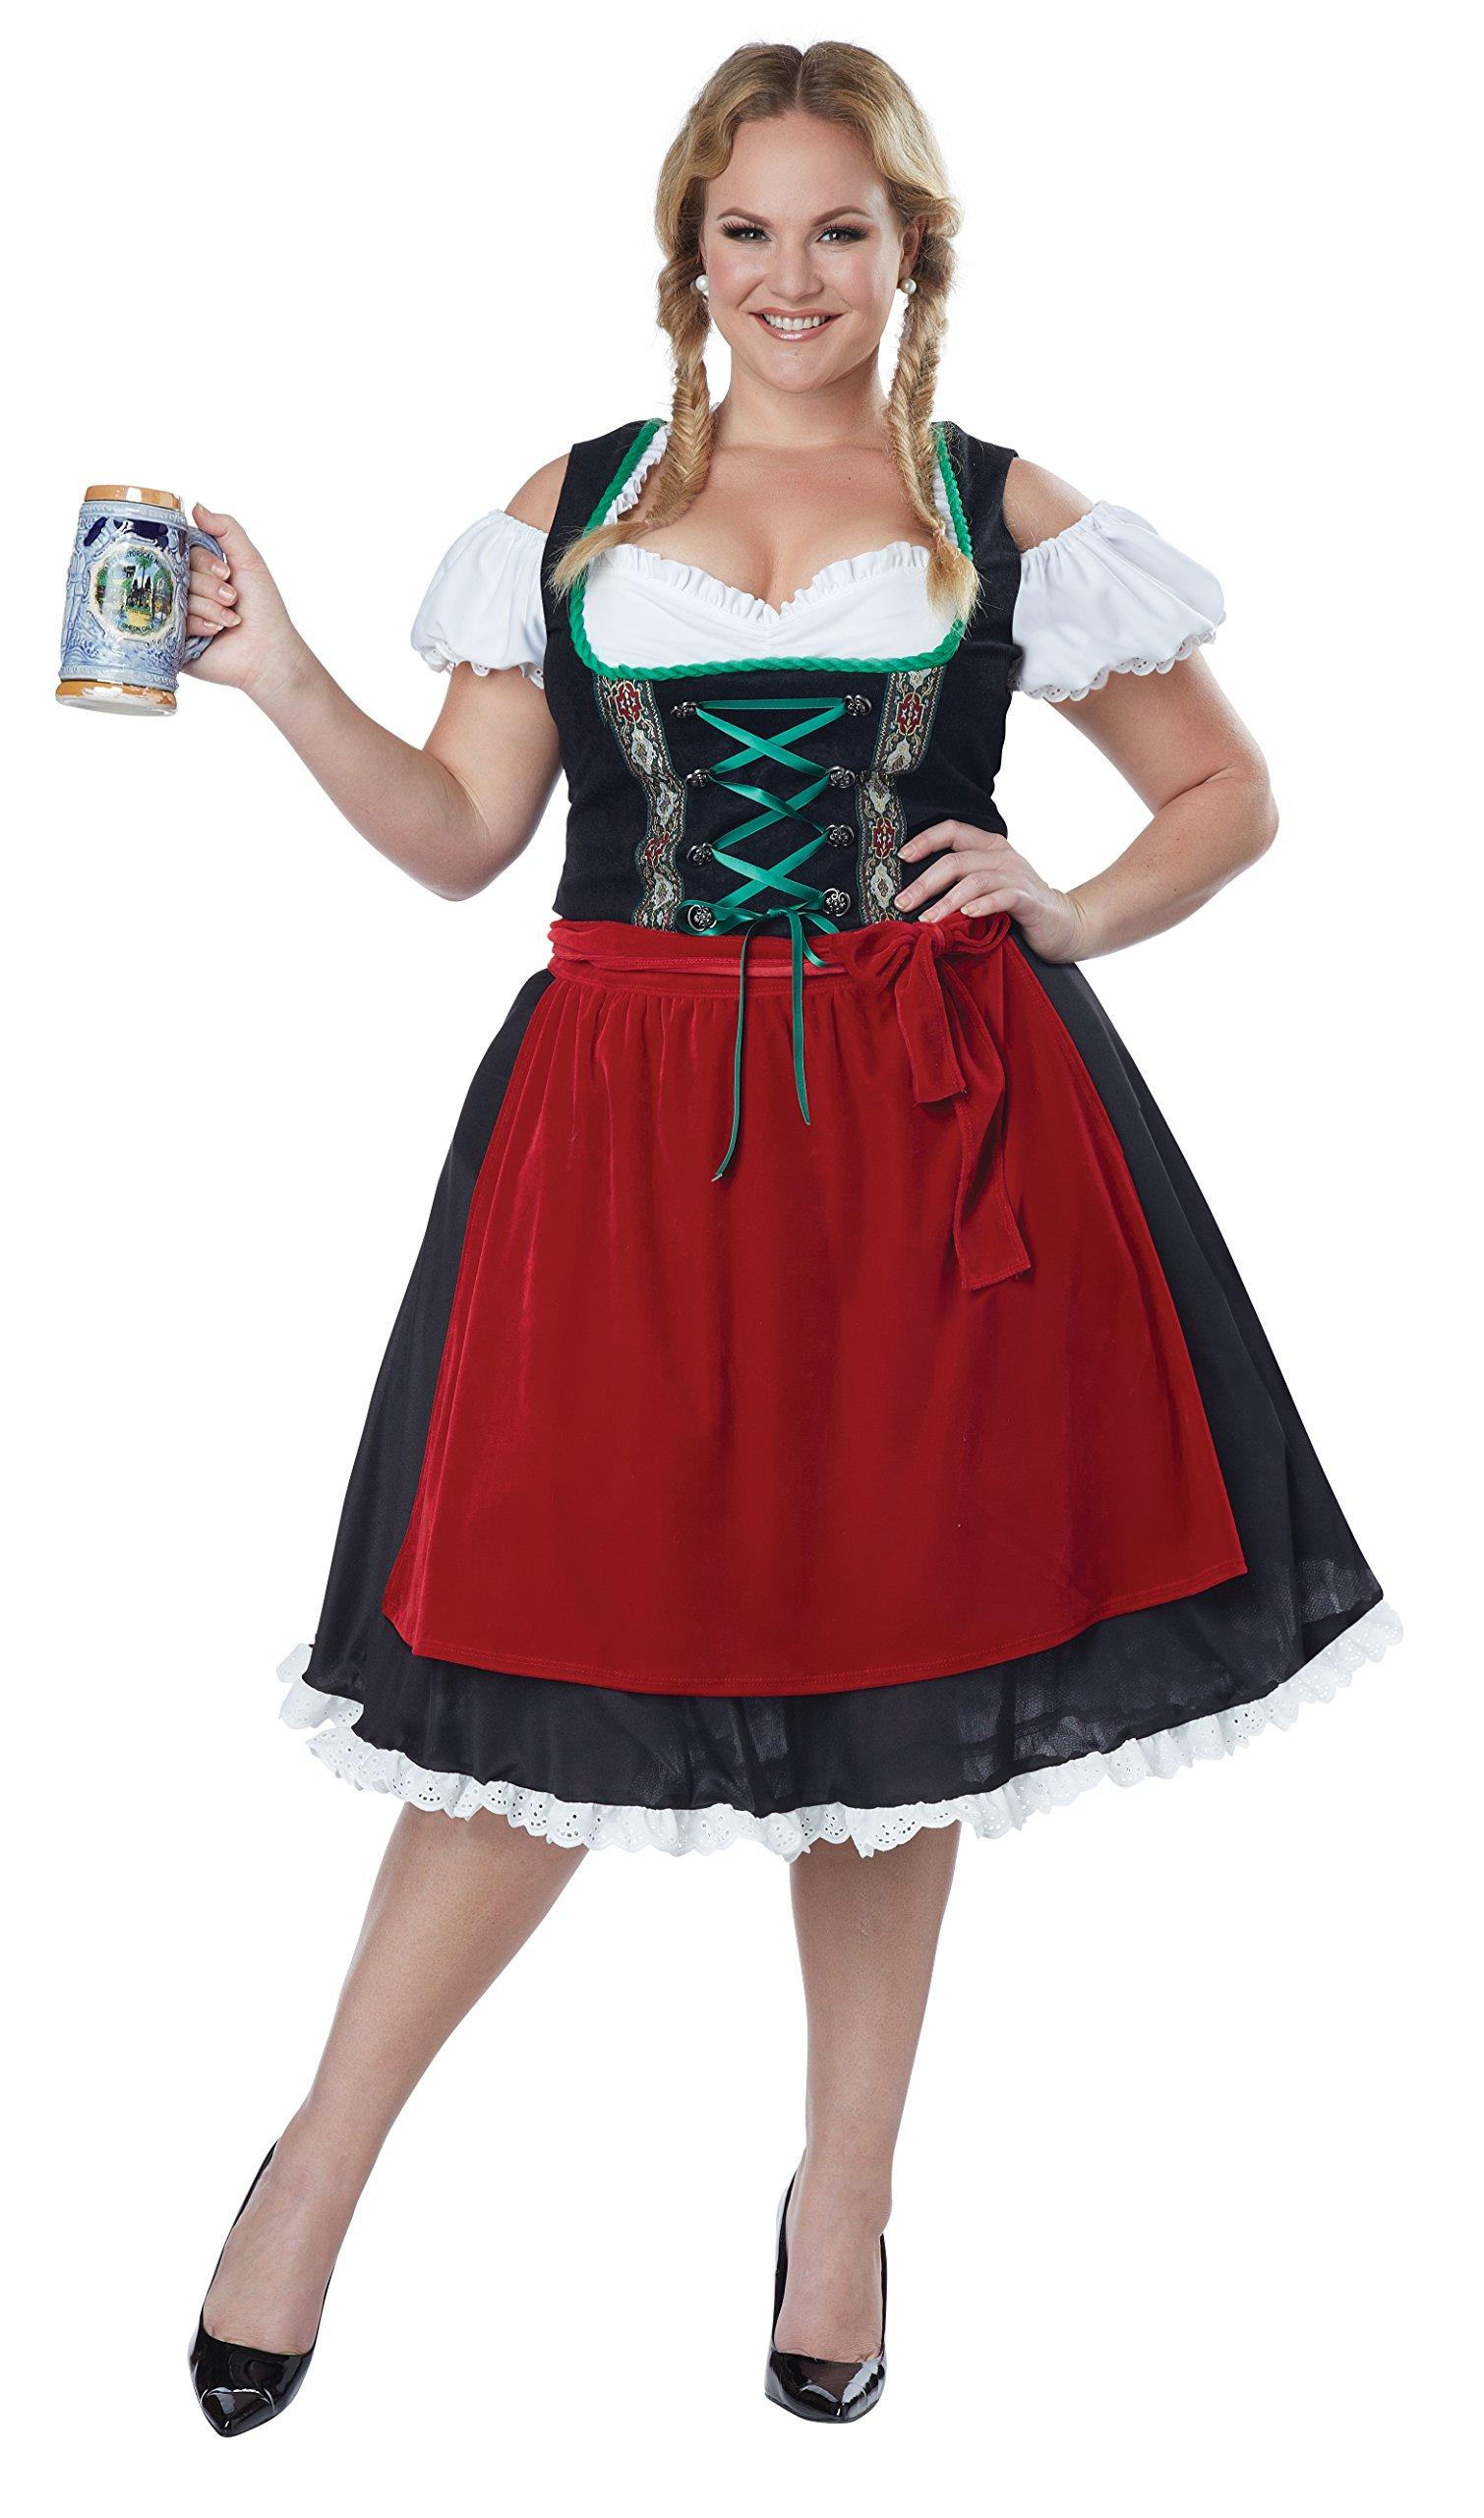 California Costumes Women's Plus Size Oktoberfest Fraulein Costume, Black/Red, 3X